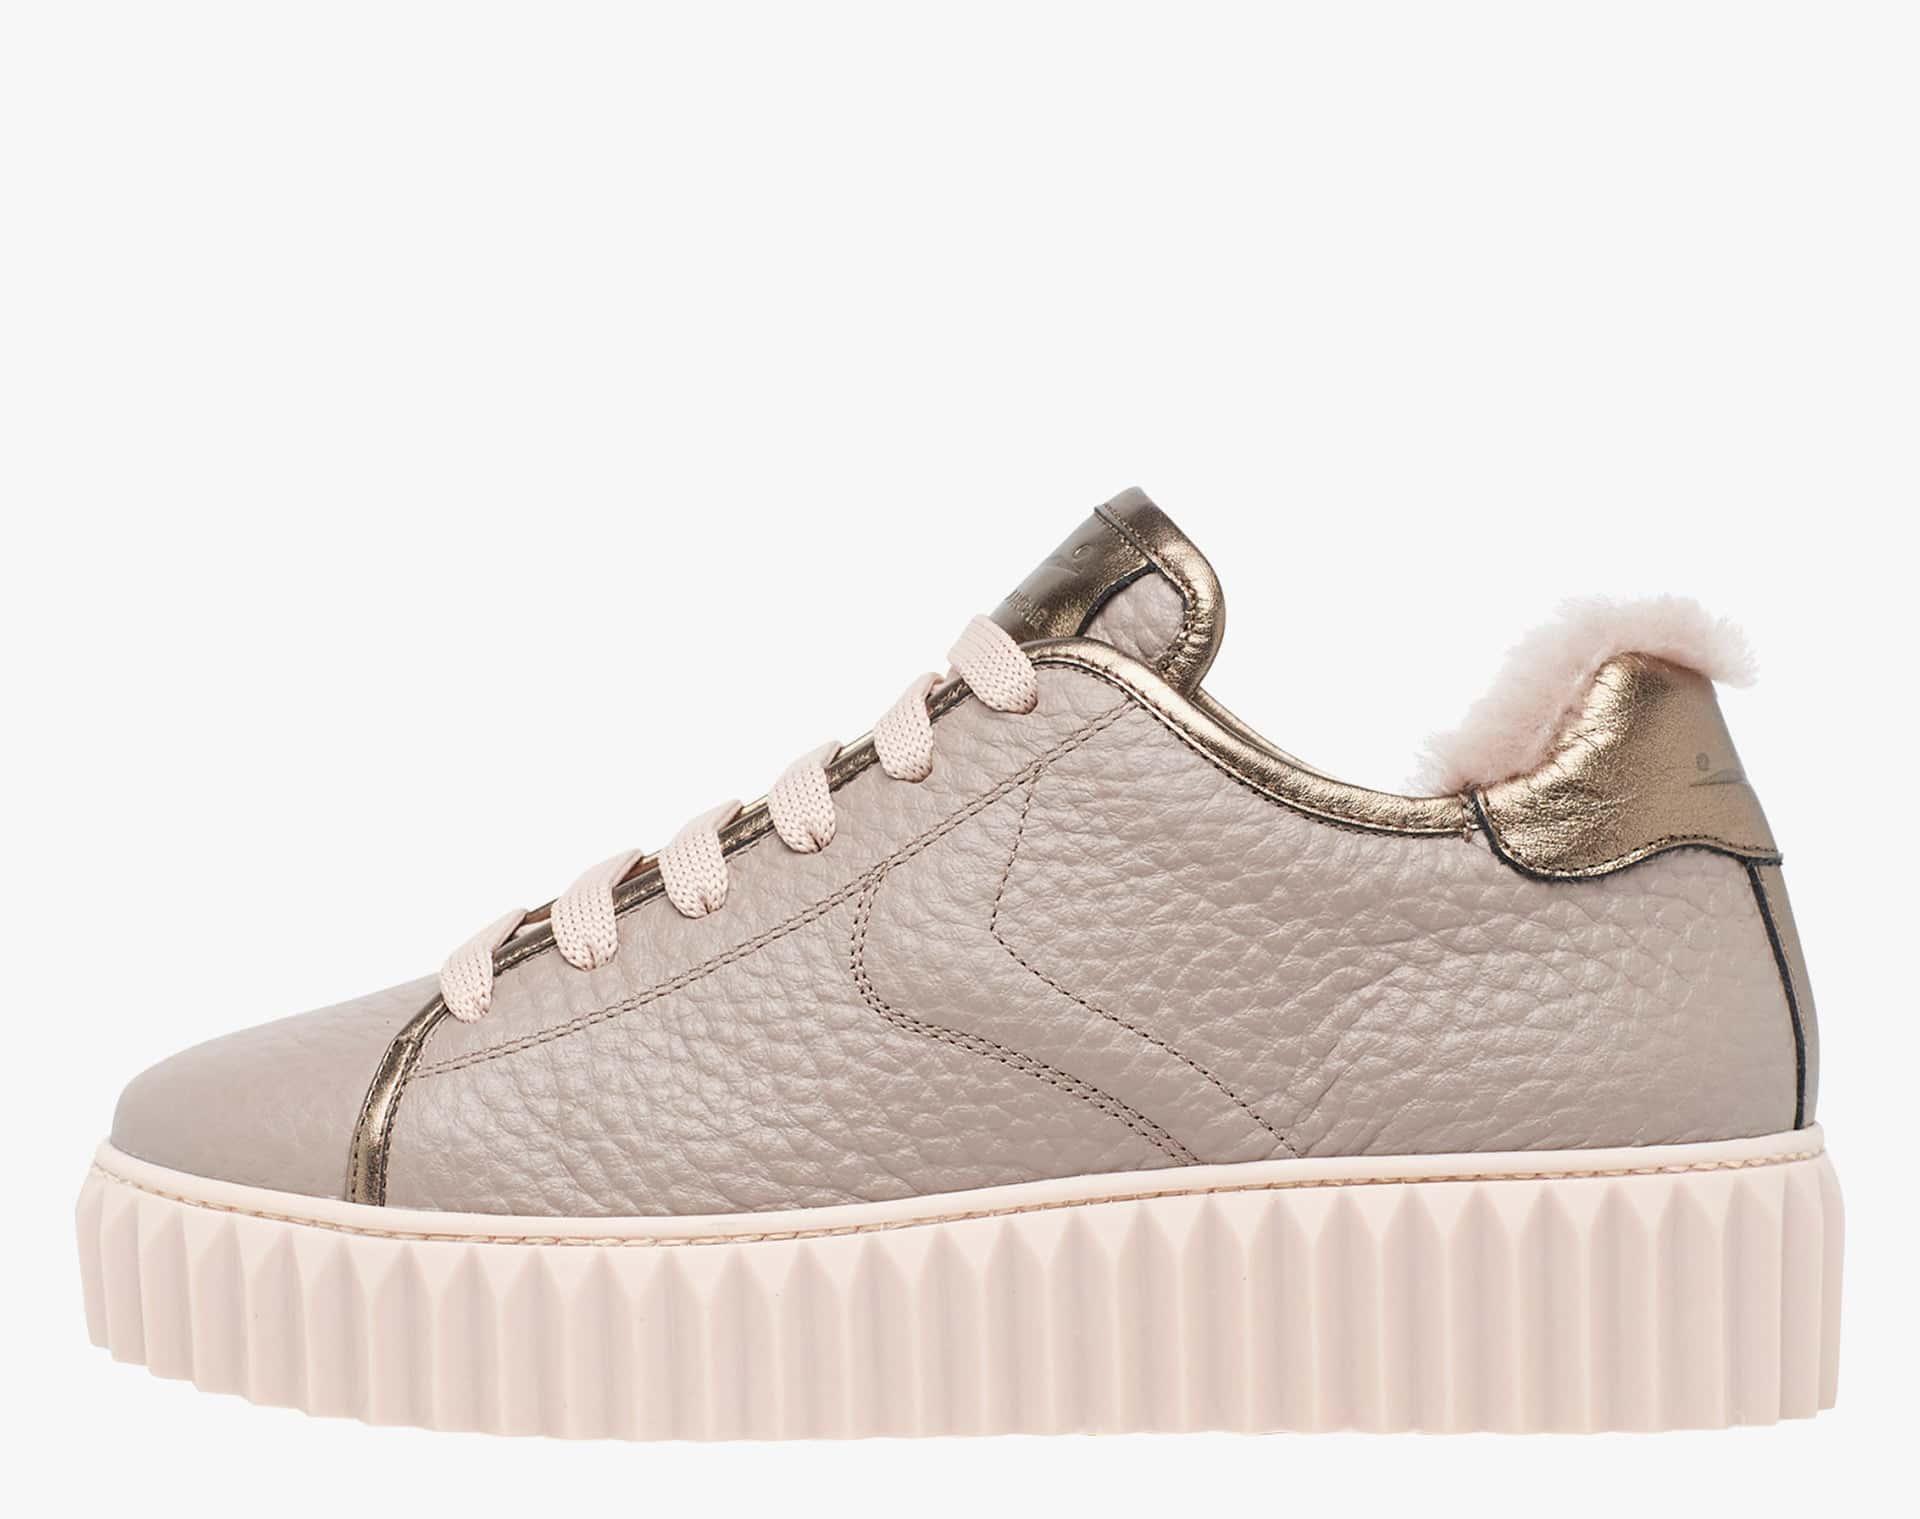 ADELE - Sneaker ibrida in vitello - Grigio